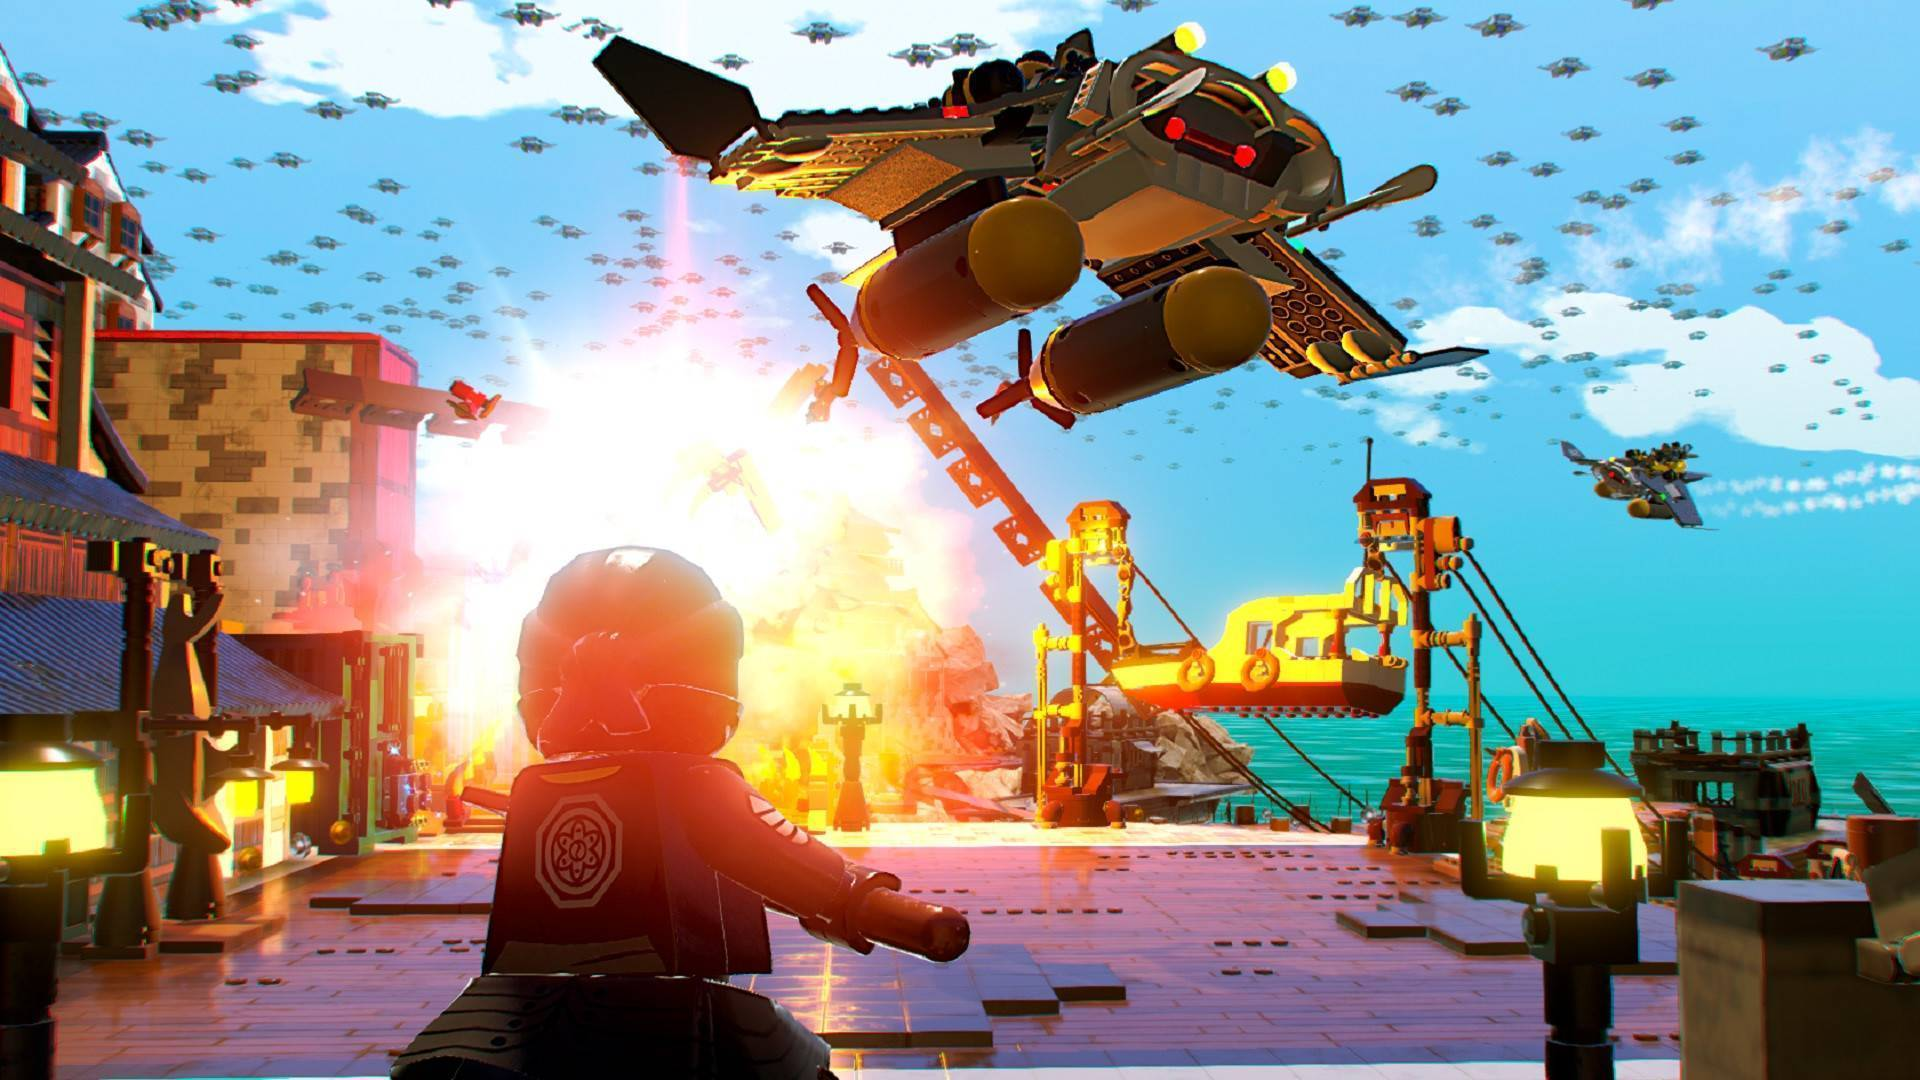 Buy The LEGO NINJAGO Movie Video Game Xbox One - compare ...